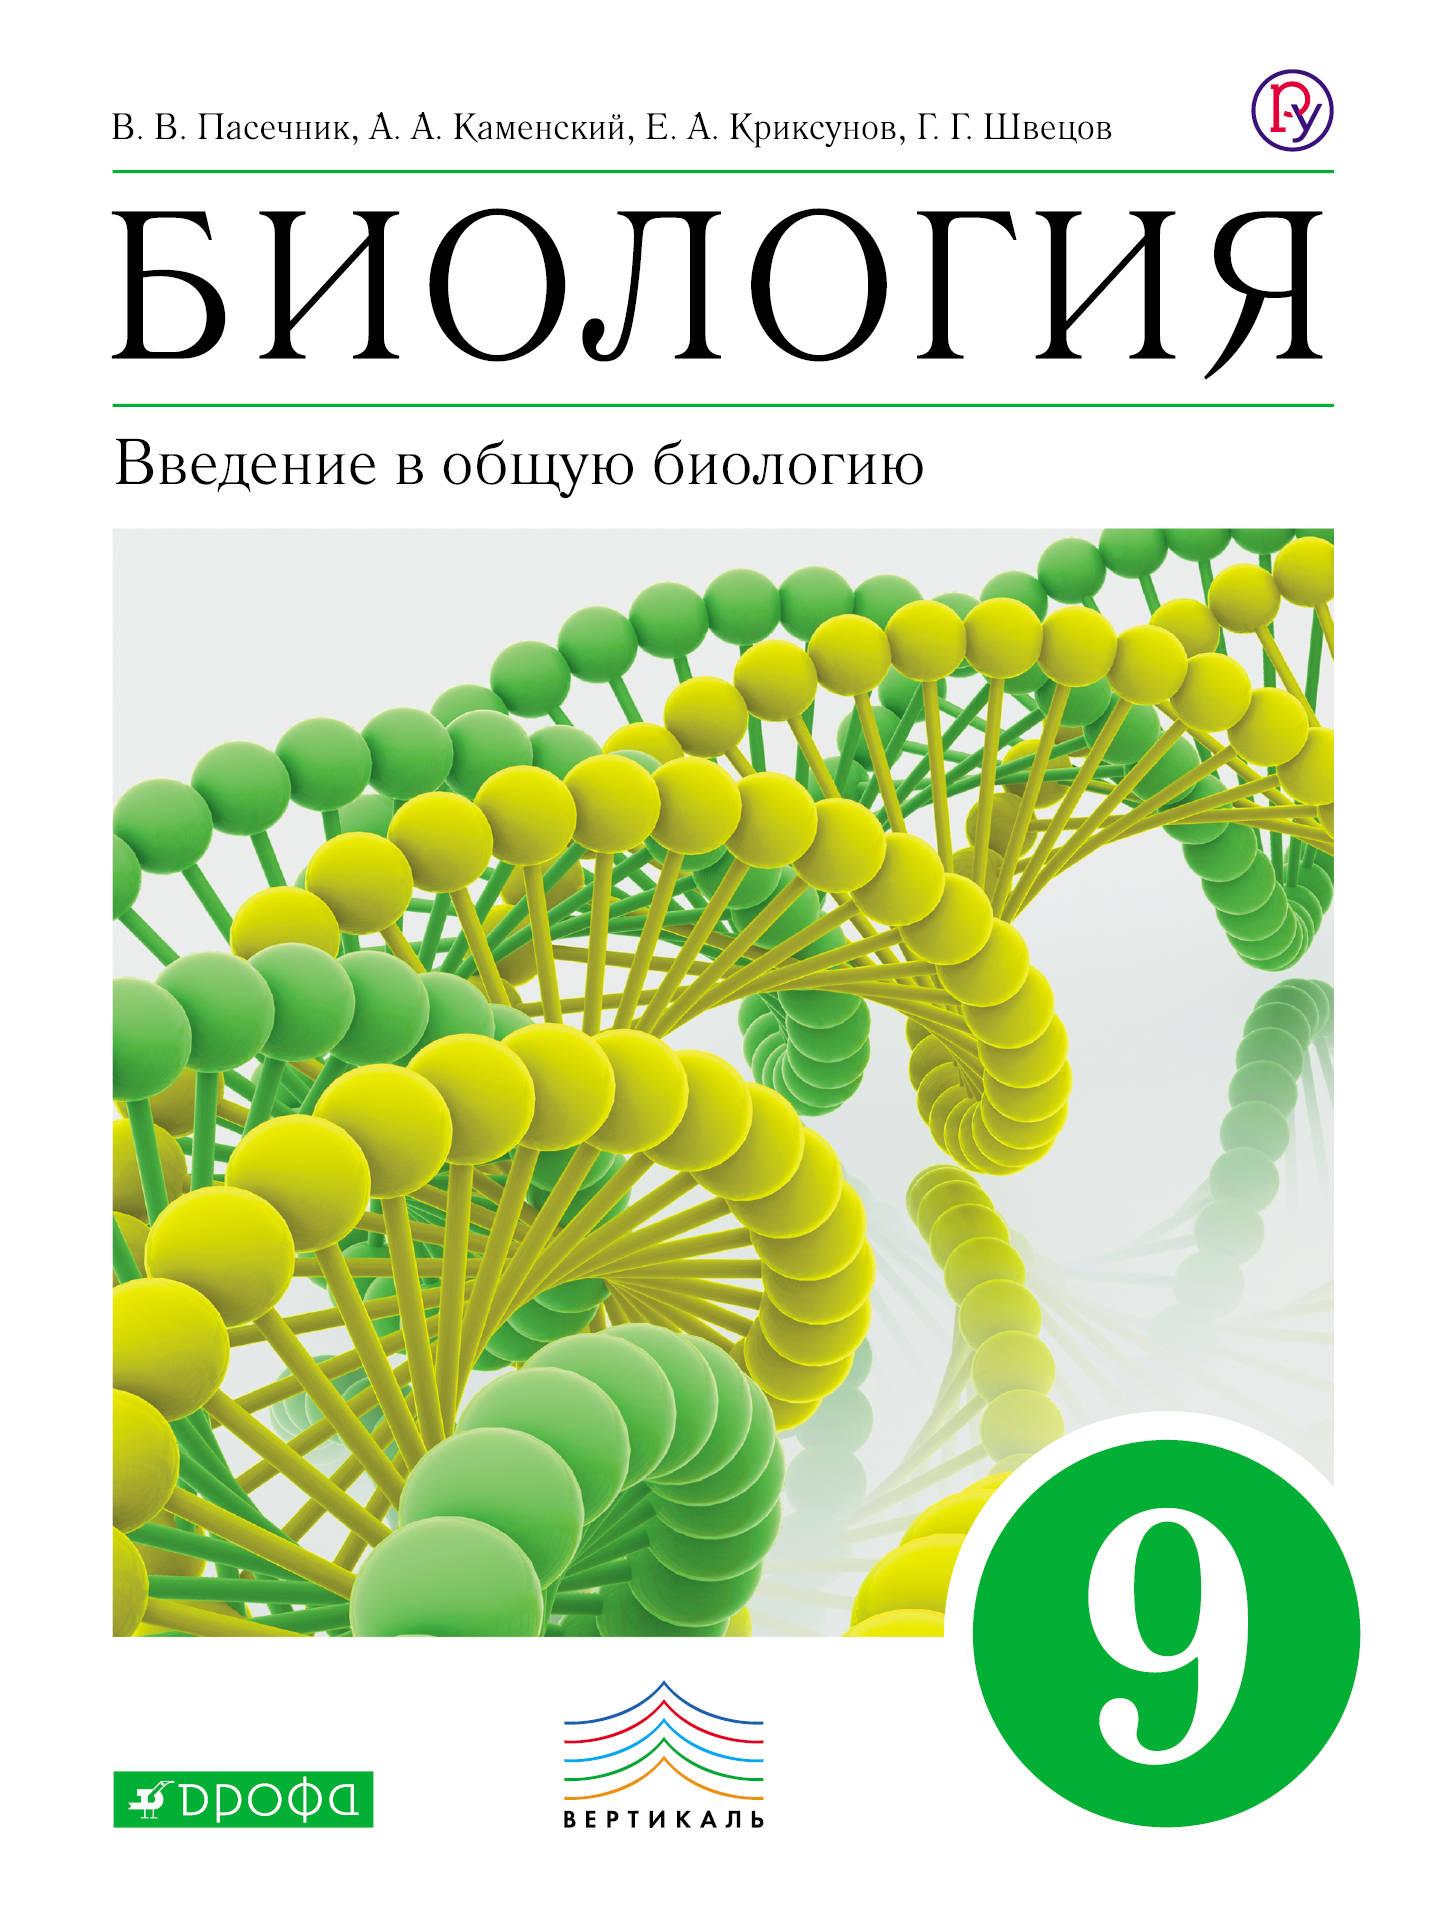 Биологии 9 класс онлайн